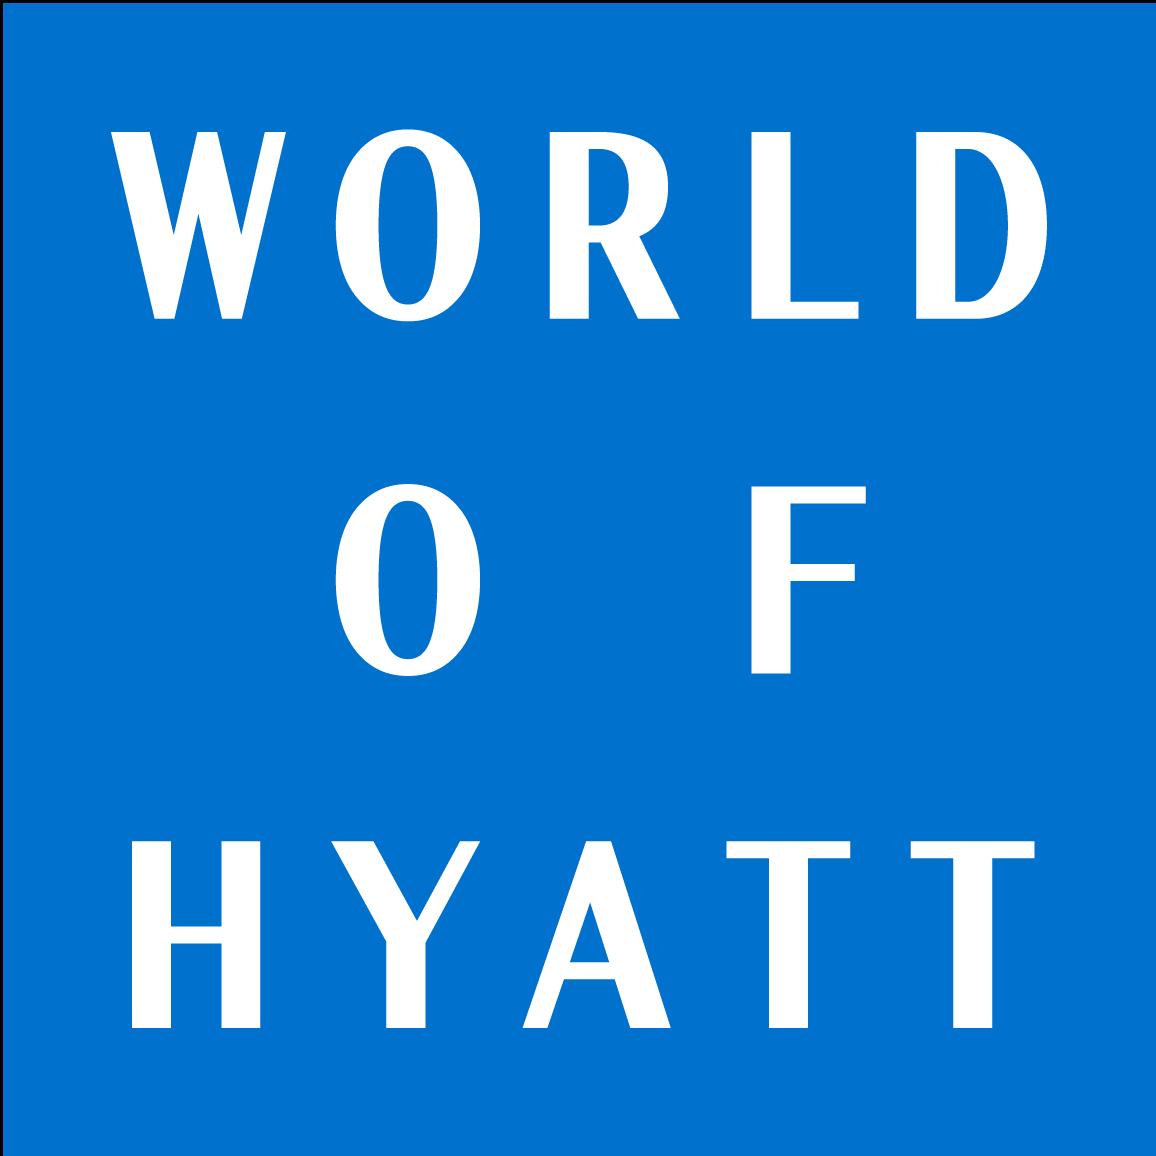 Hyatt crop